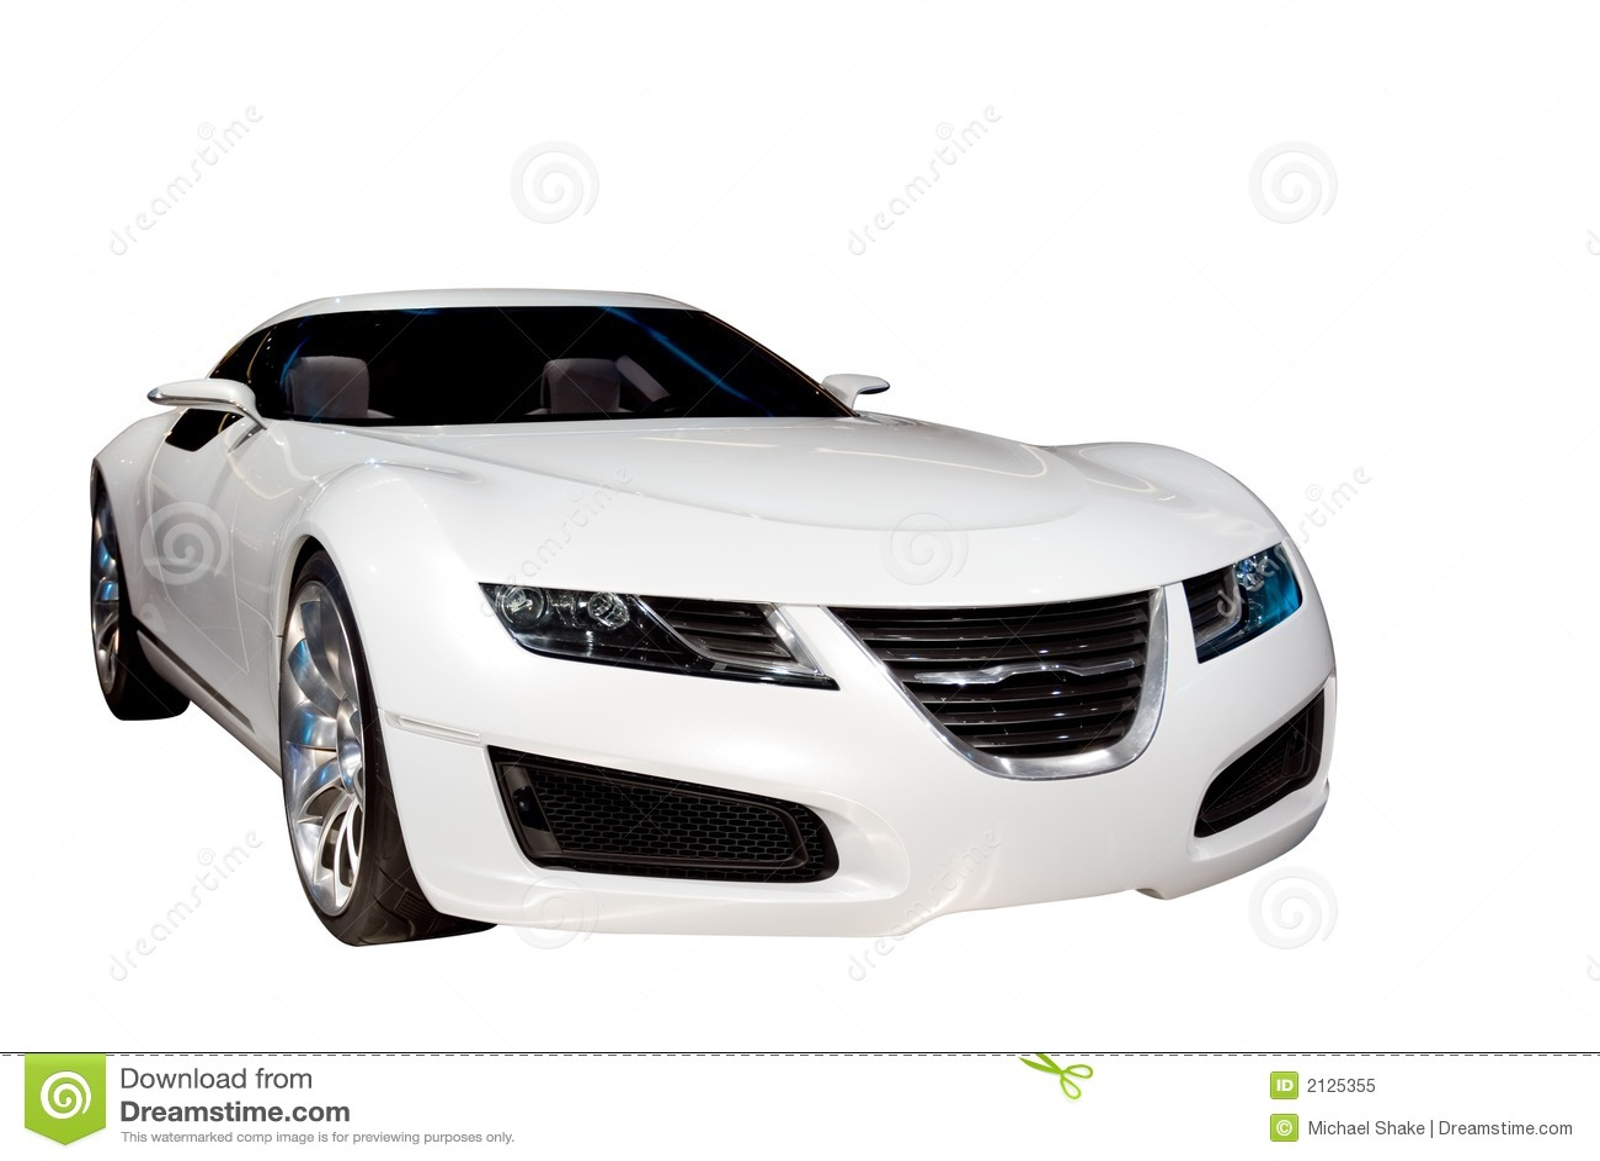 Luxury Sports Car Stock Image Image Of Modern Automobile